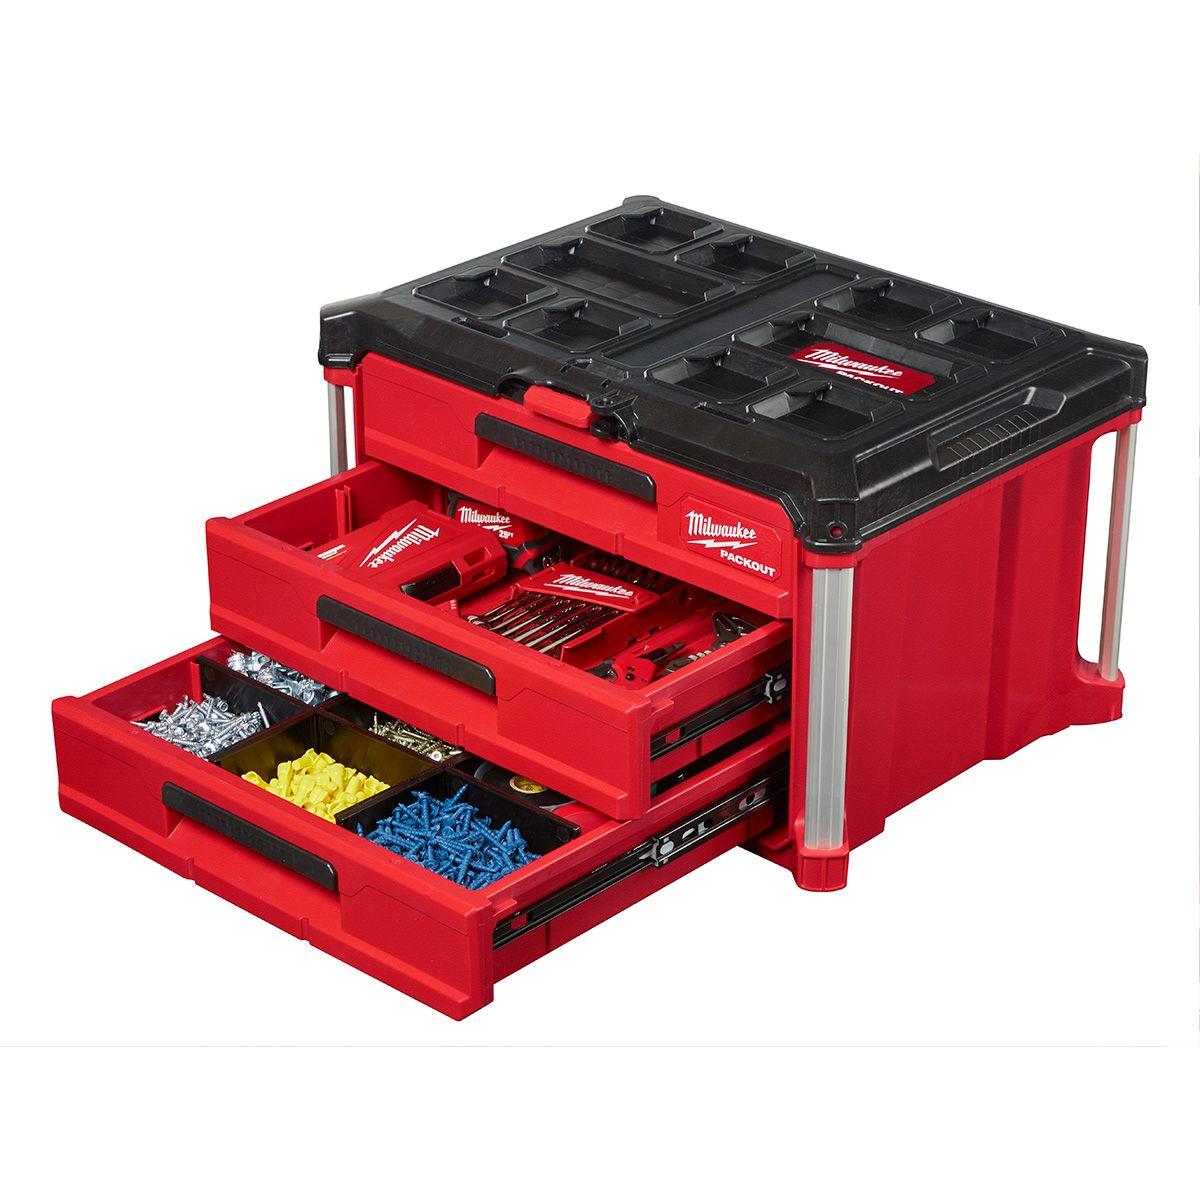 Milwaukee 48-22-8443 Coffre 3 tiroirs Packout